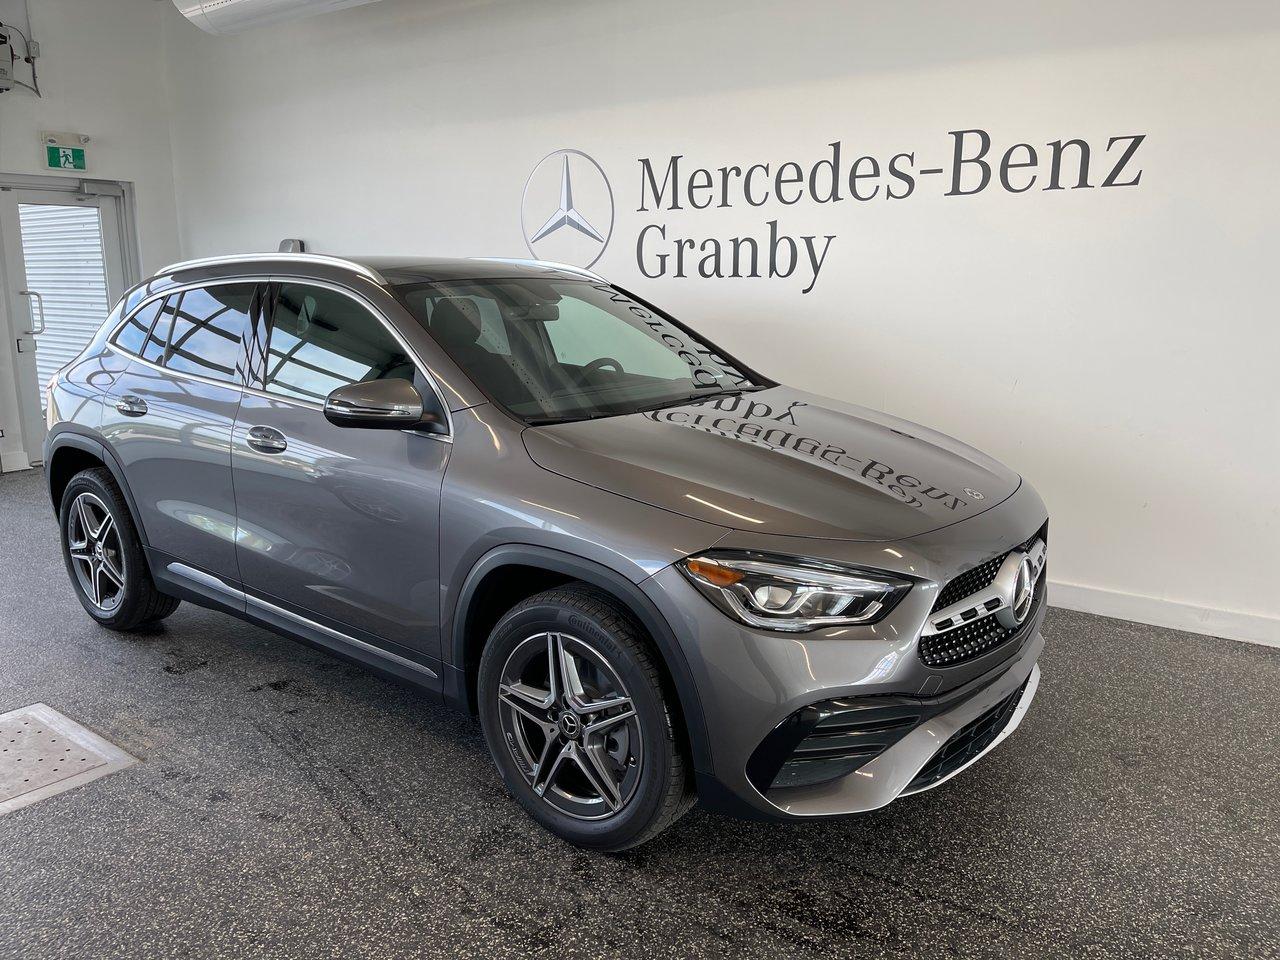 Mercedes-Benz GLA 2021 GLA 250 premium + sport